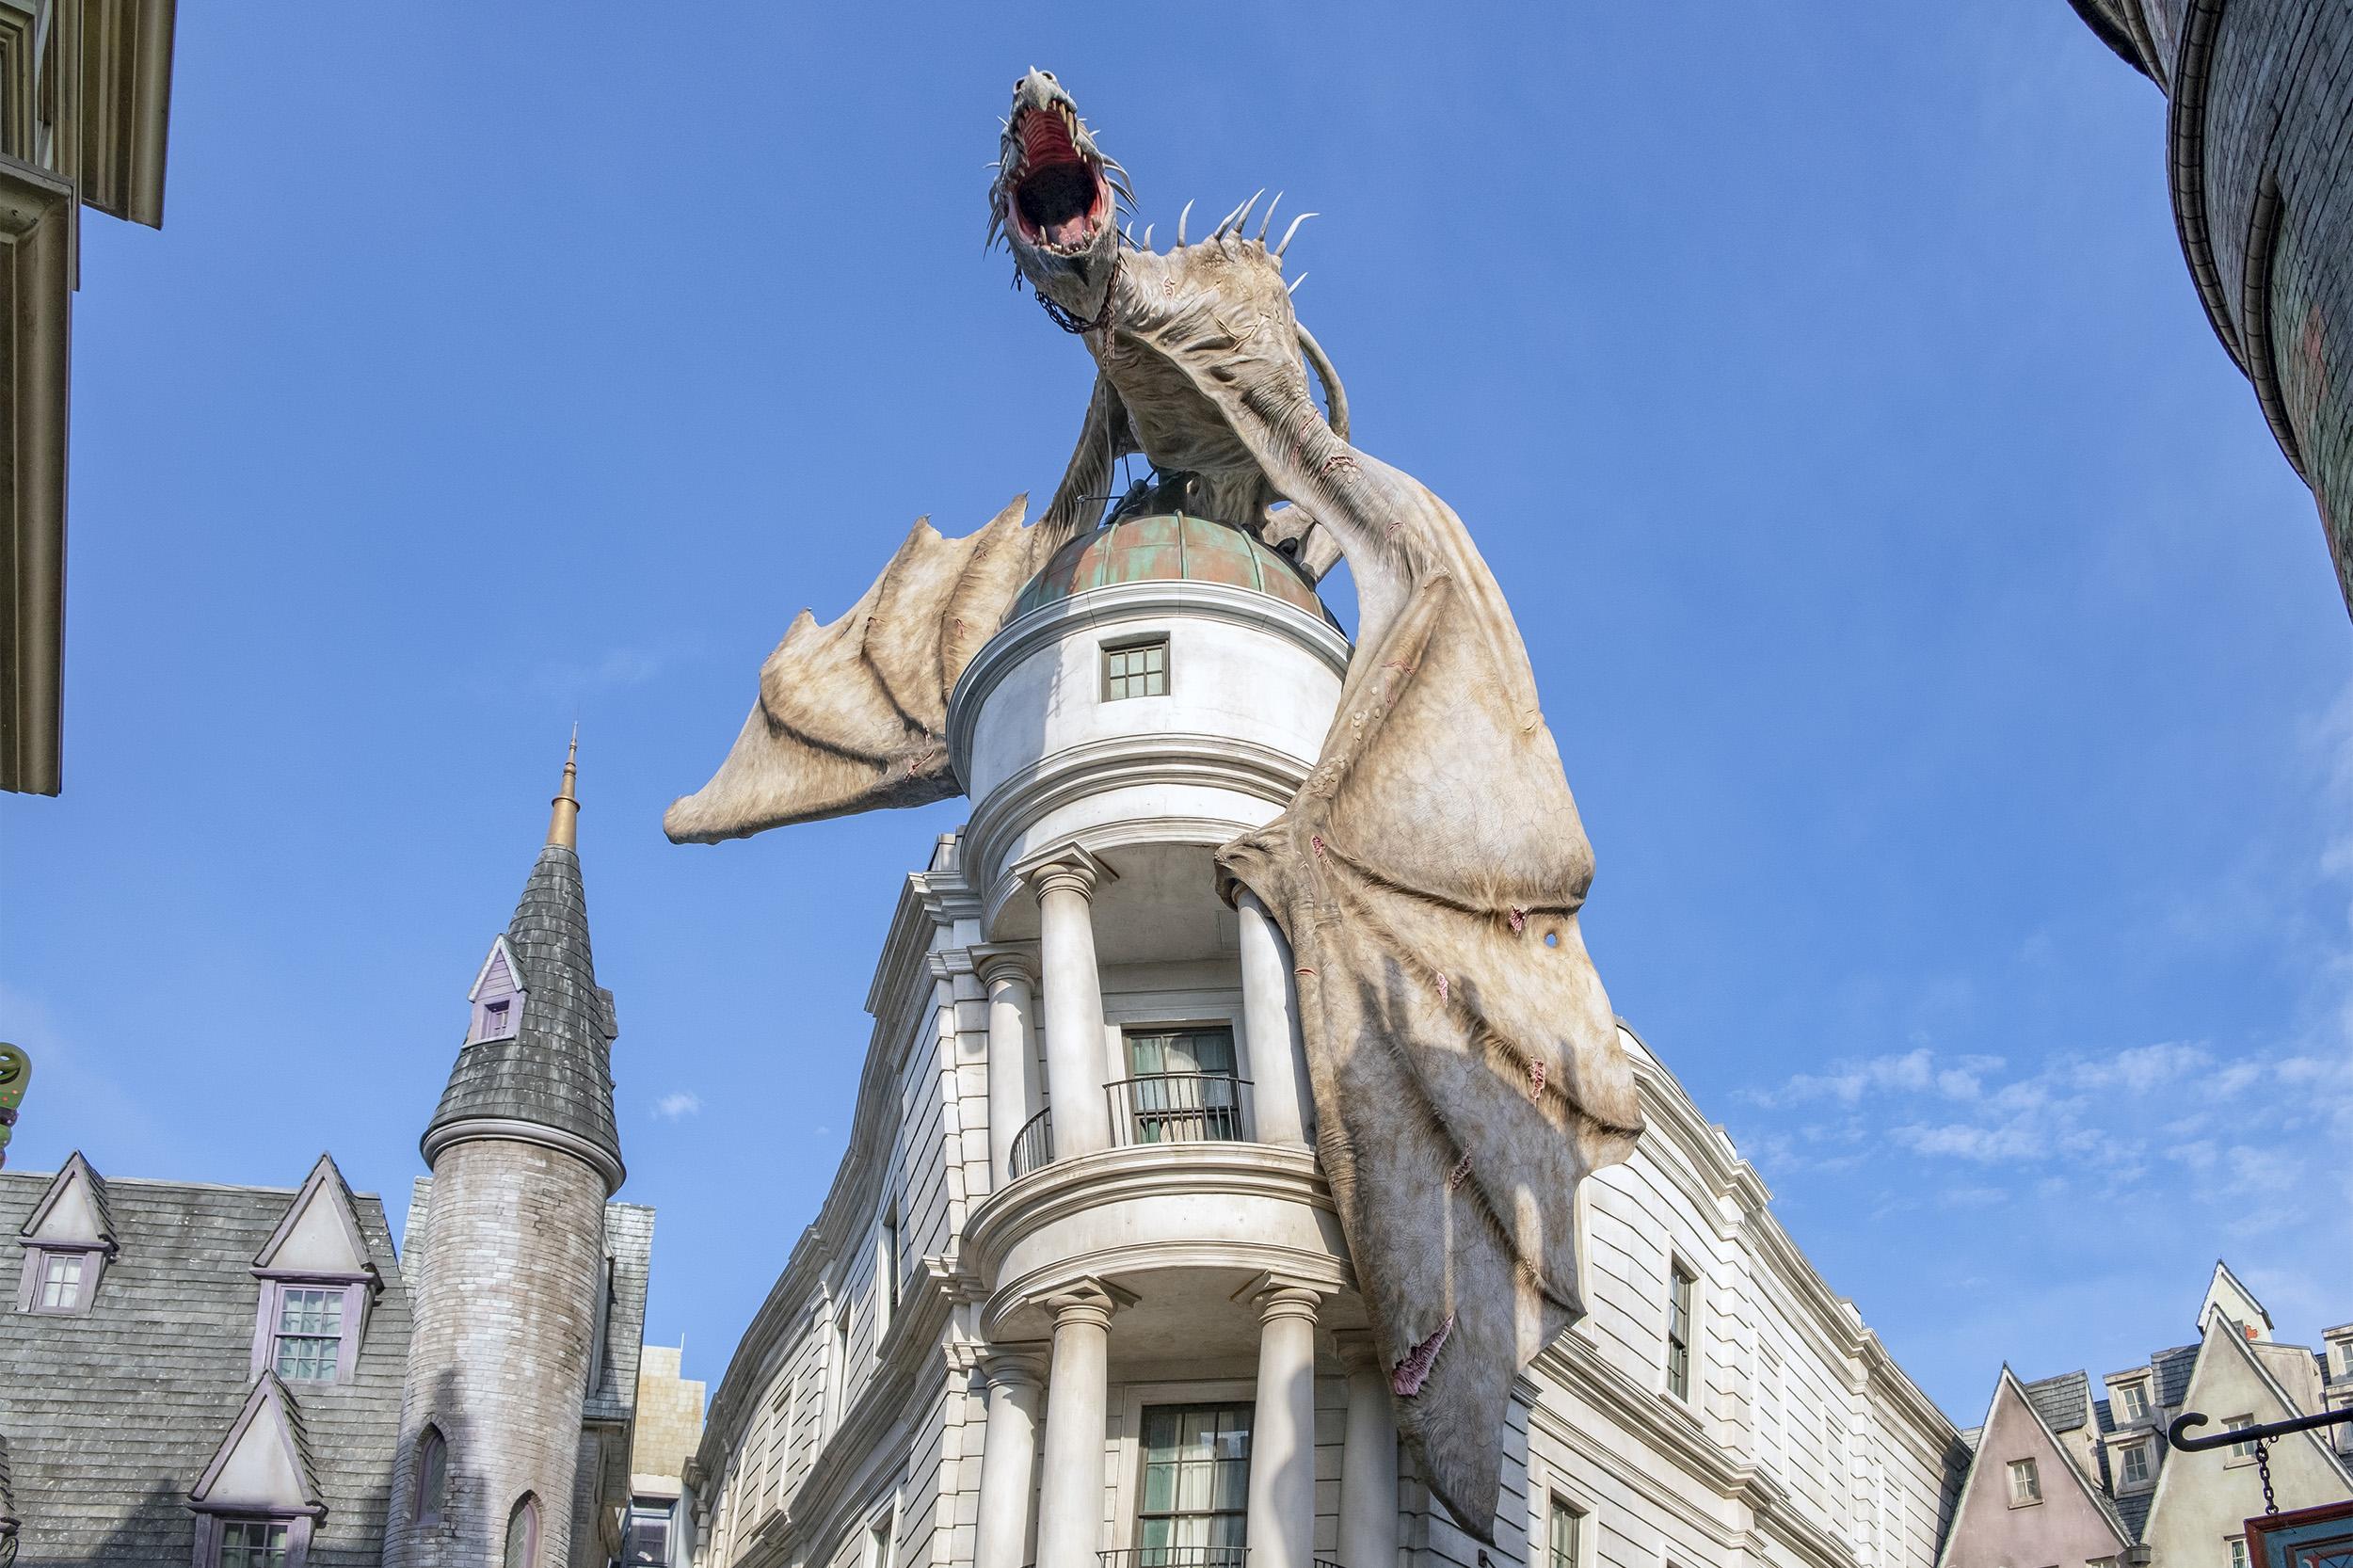 drake gringotts diagon alley the wizarding world of harry potter orlando